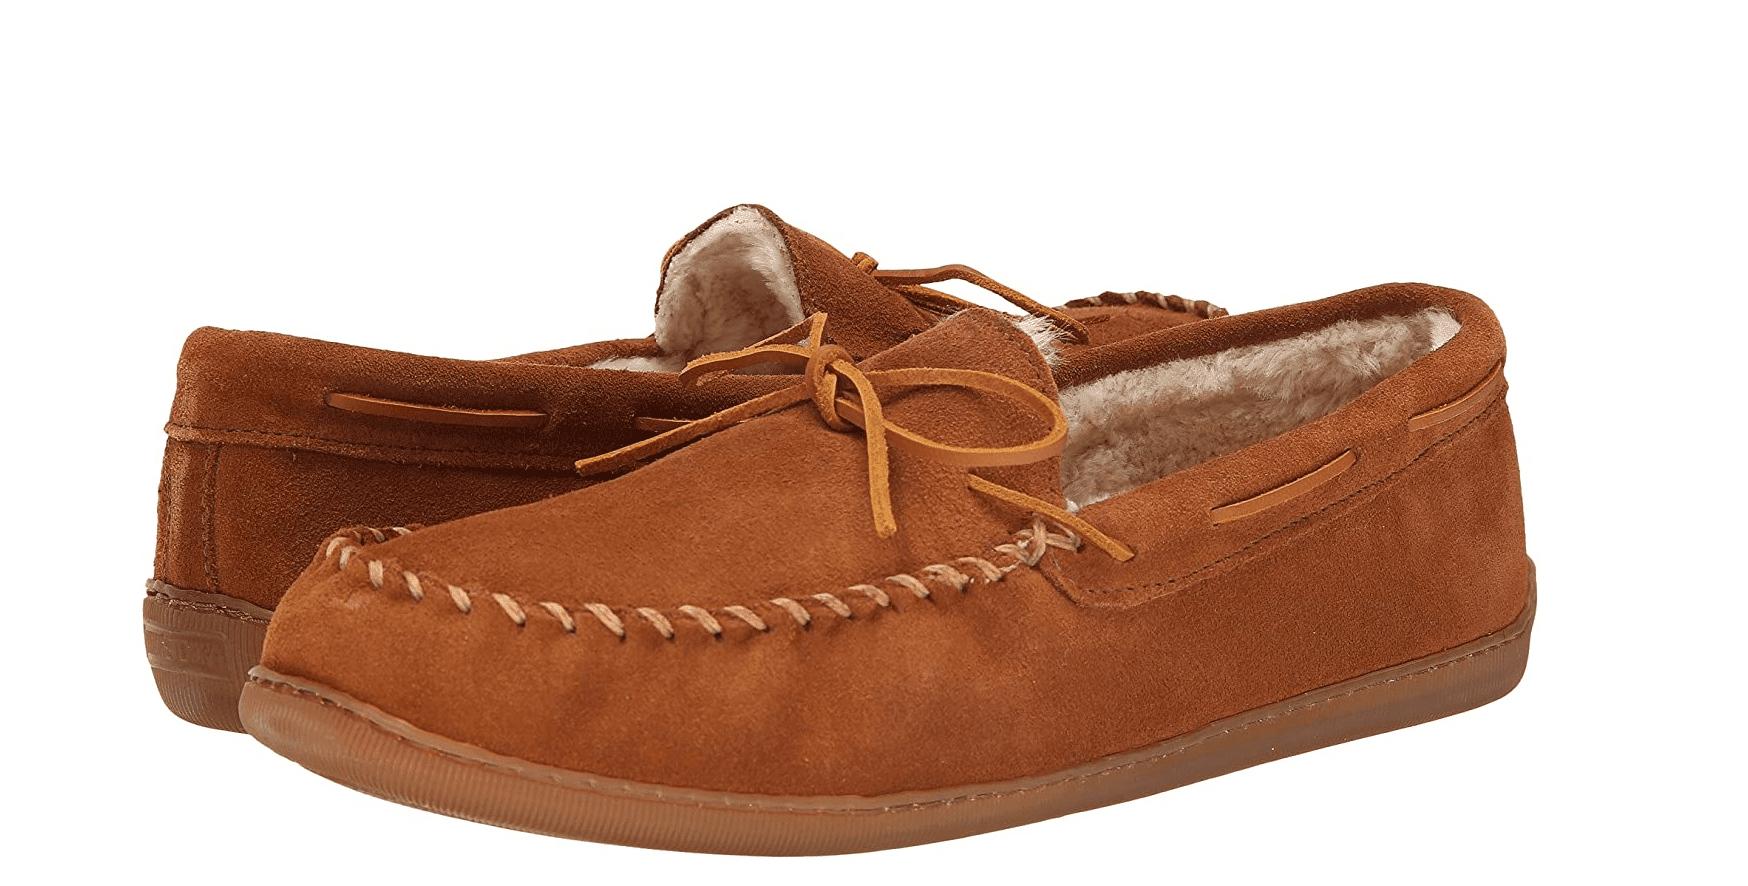 Minnetonka Men's Moccasin Slippers